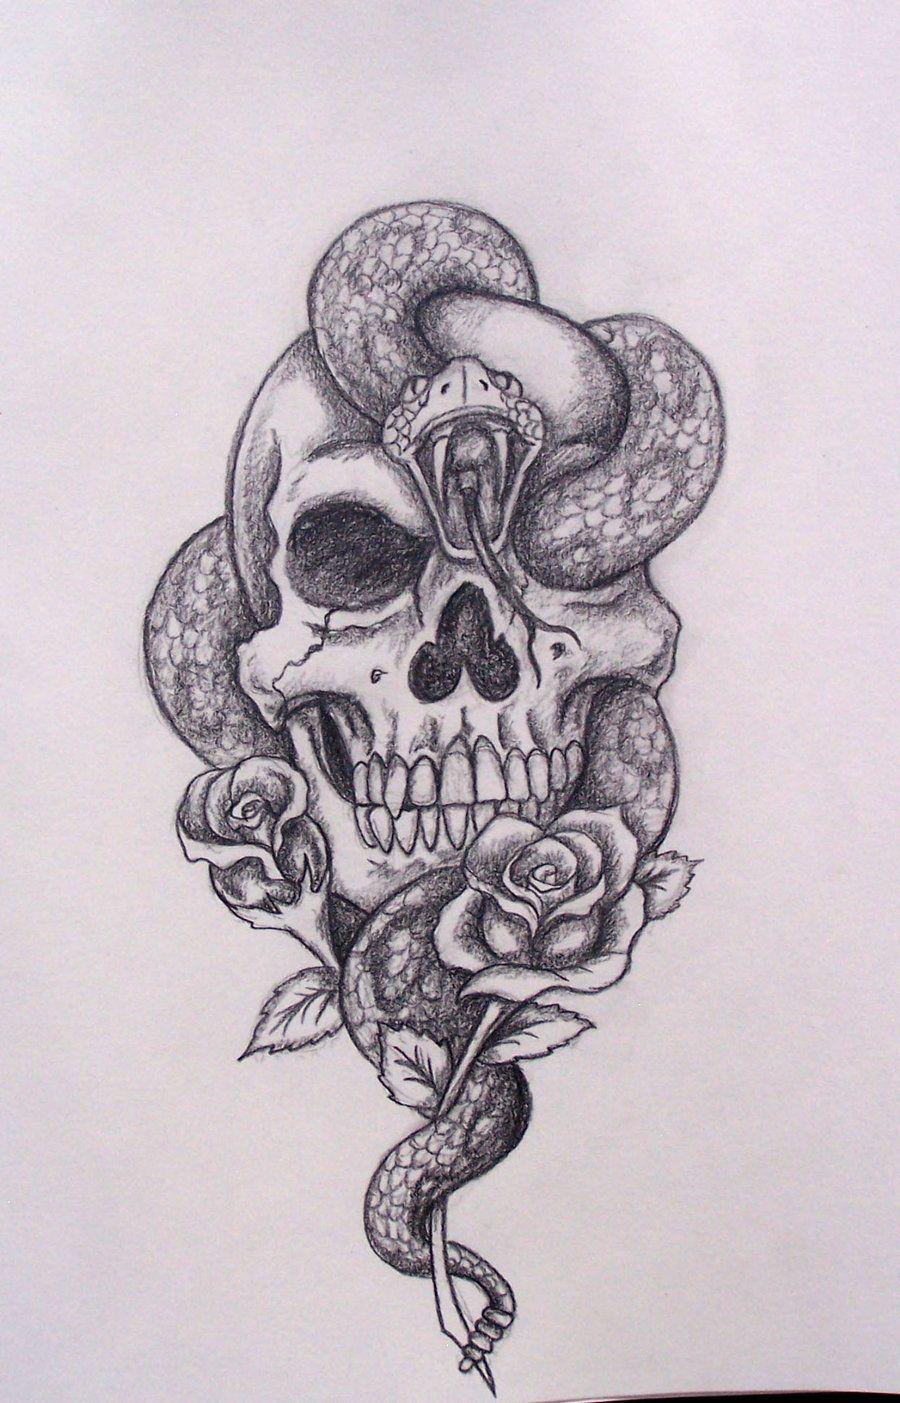 Snake skull drawing cool tattoo idea tattoo pinterest snake skull drawing cool tattoo idea thecheapjerseys Images